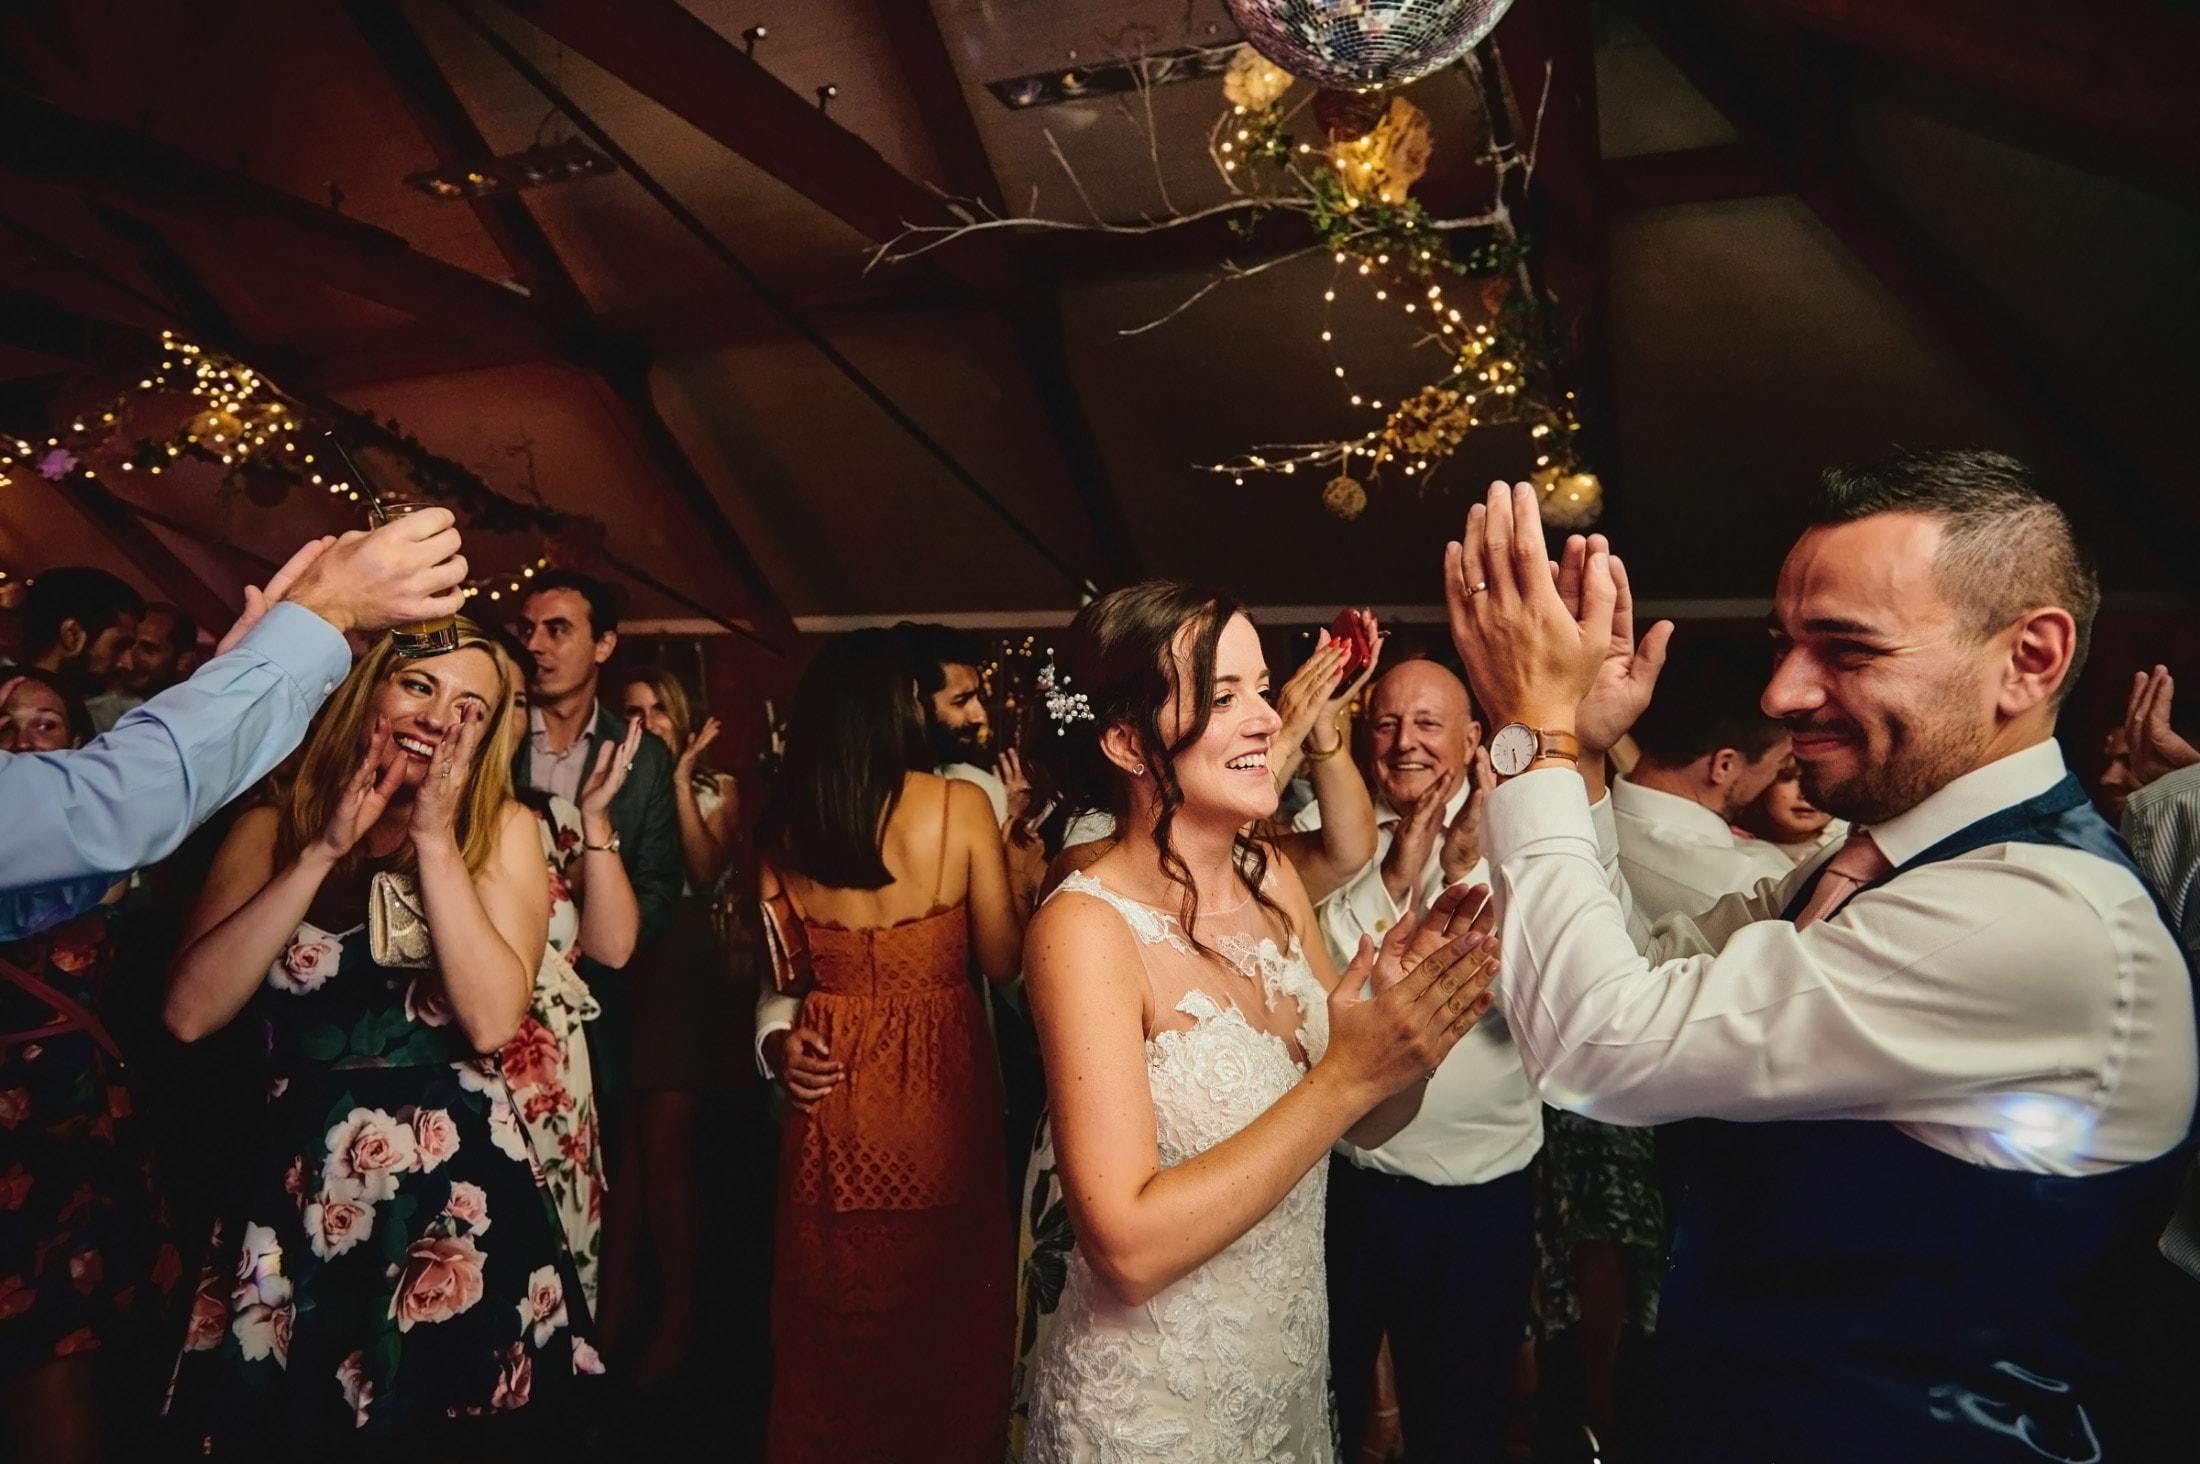 Bride, groom and wedding guests having fun on dancefloor